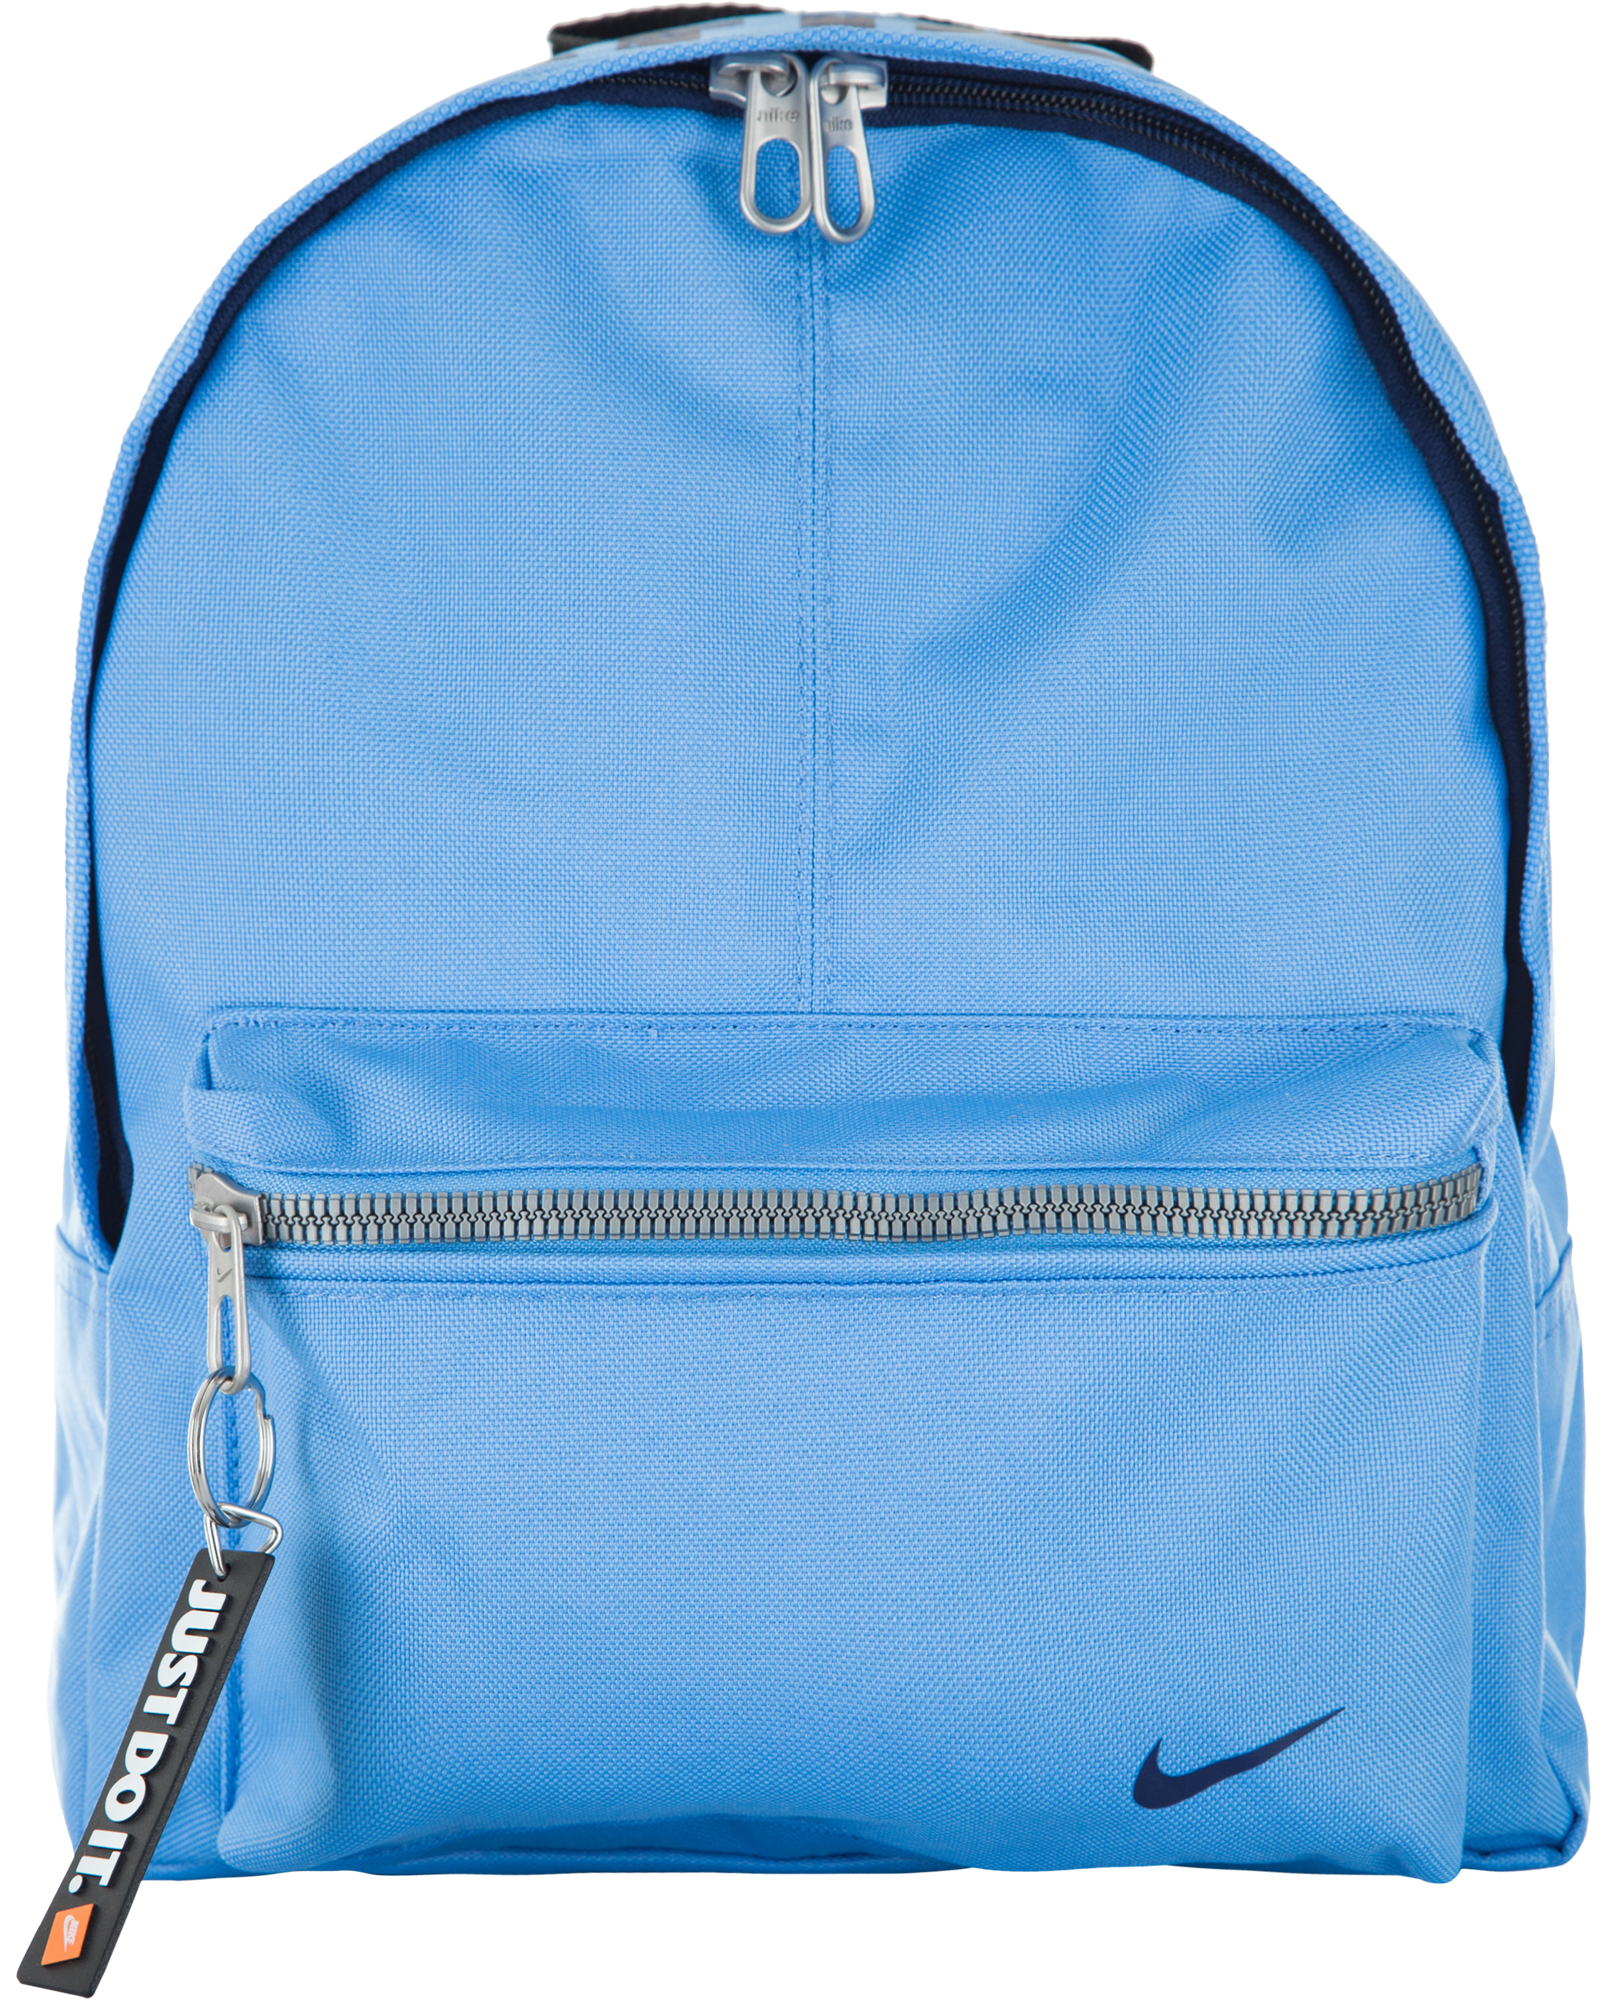 Nike Рюкзак для девочек Nike Classic, размер Без размера рюкзак детский nike brasilia backpack ba5473 480